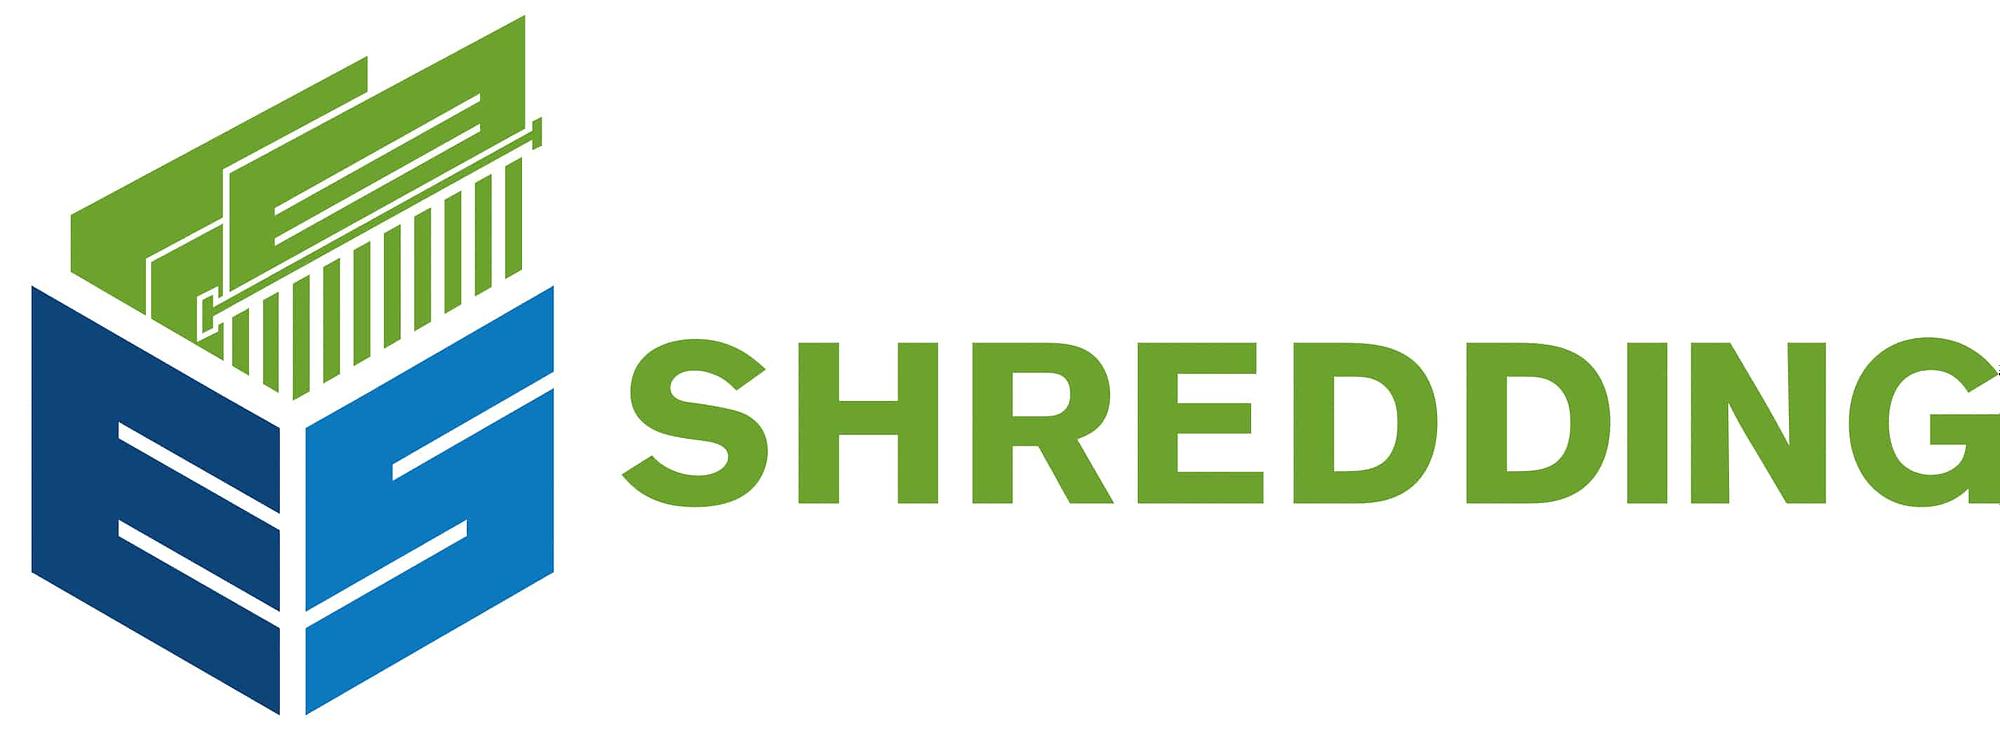 Shredding Logo, no EvaStore